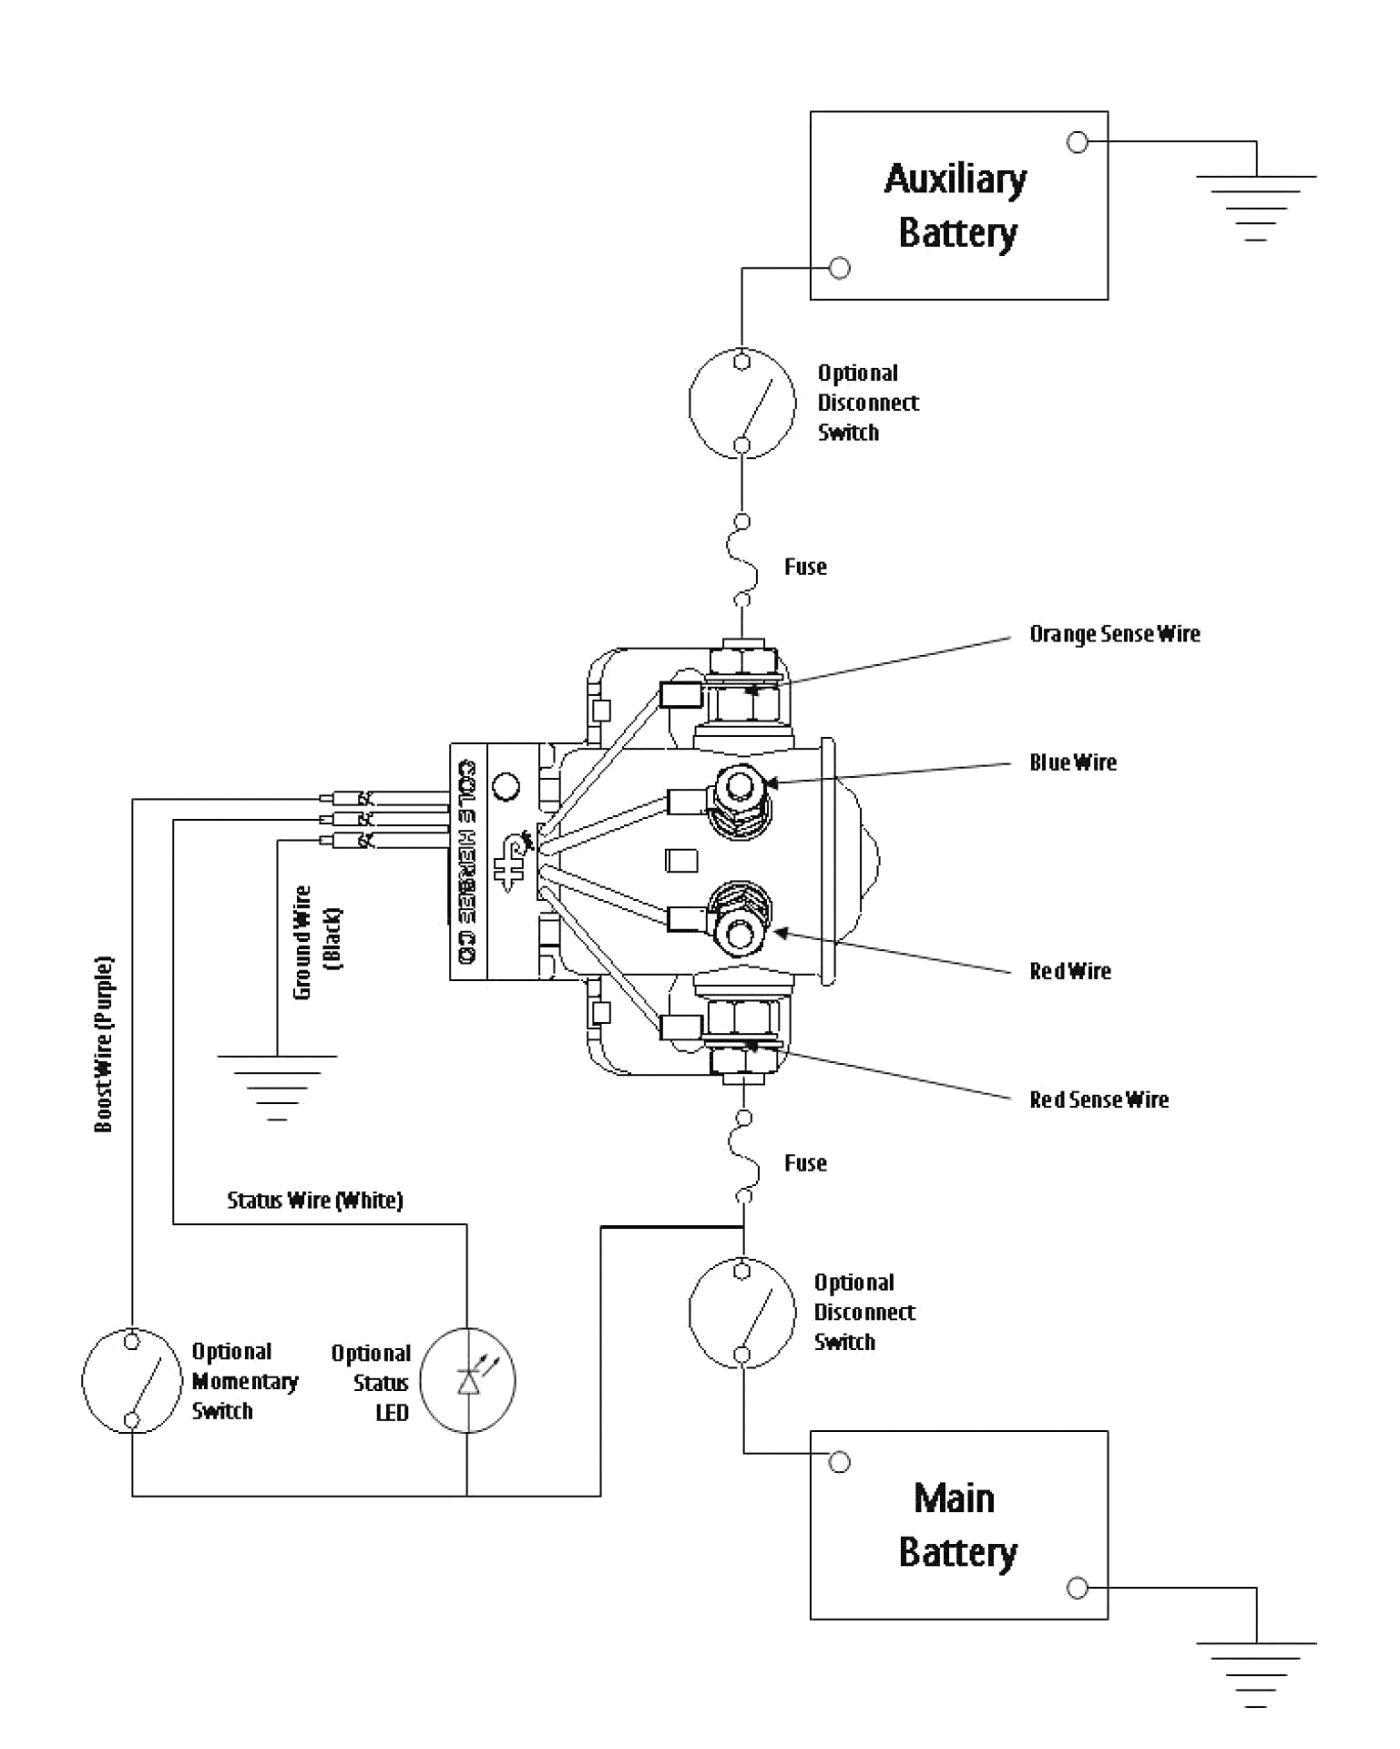 solar panel diagram wiring diagram for solar panel to battery zookastar of solar panel diagram jpg